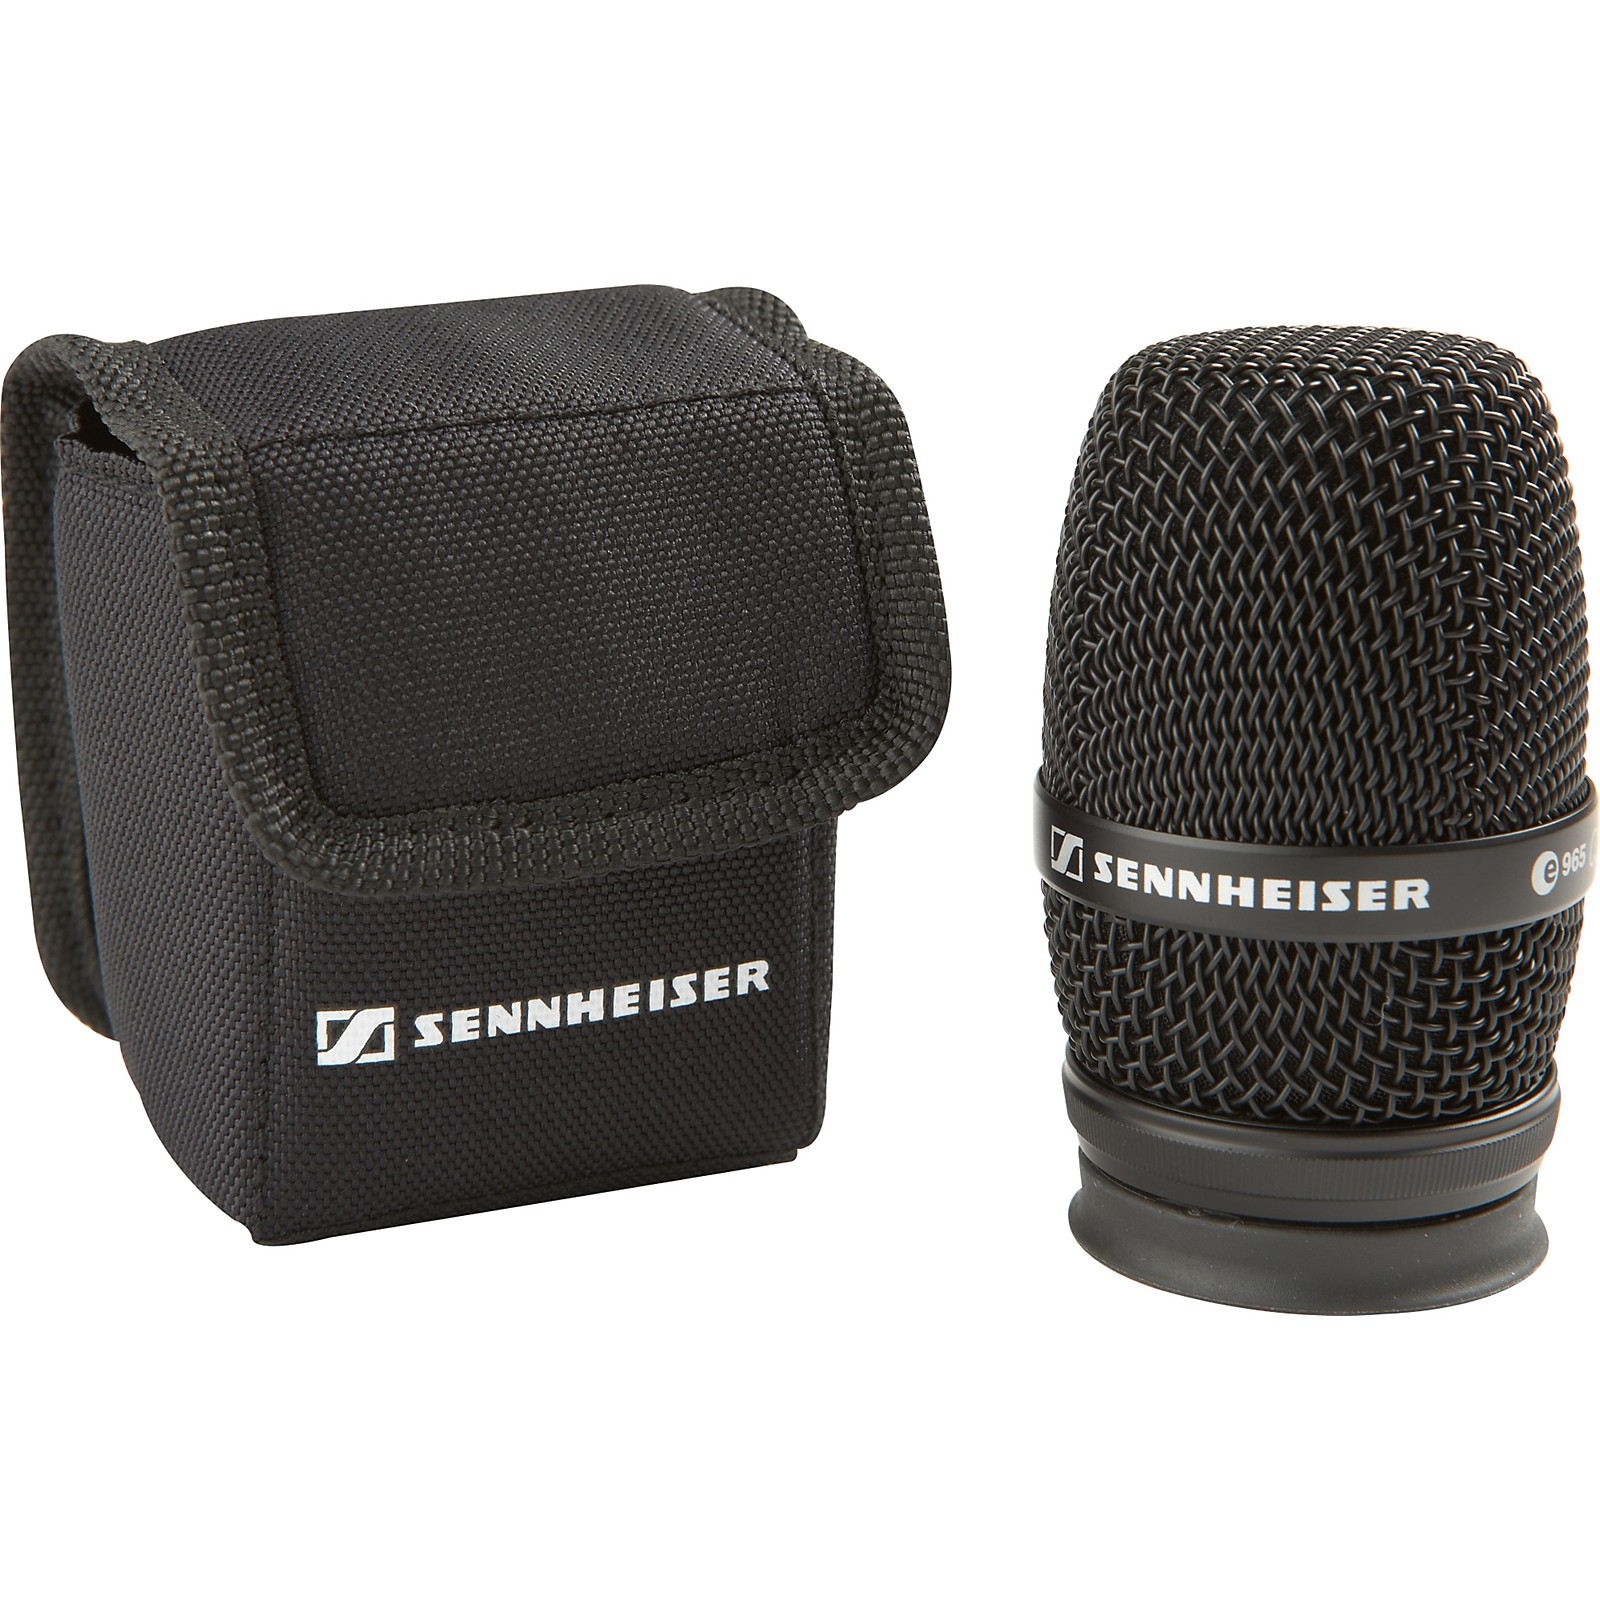 Open Box Sennheiser MMK 965-1 e965 Wireless Microphone Capsule